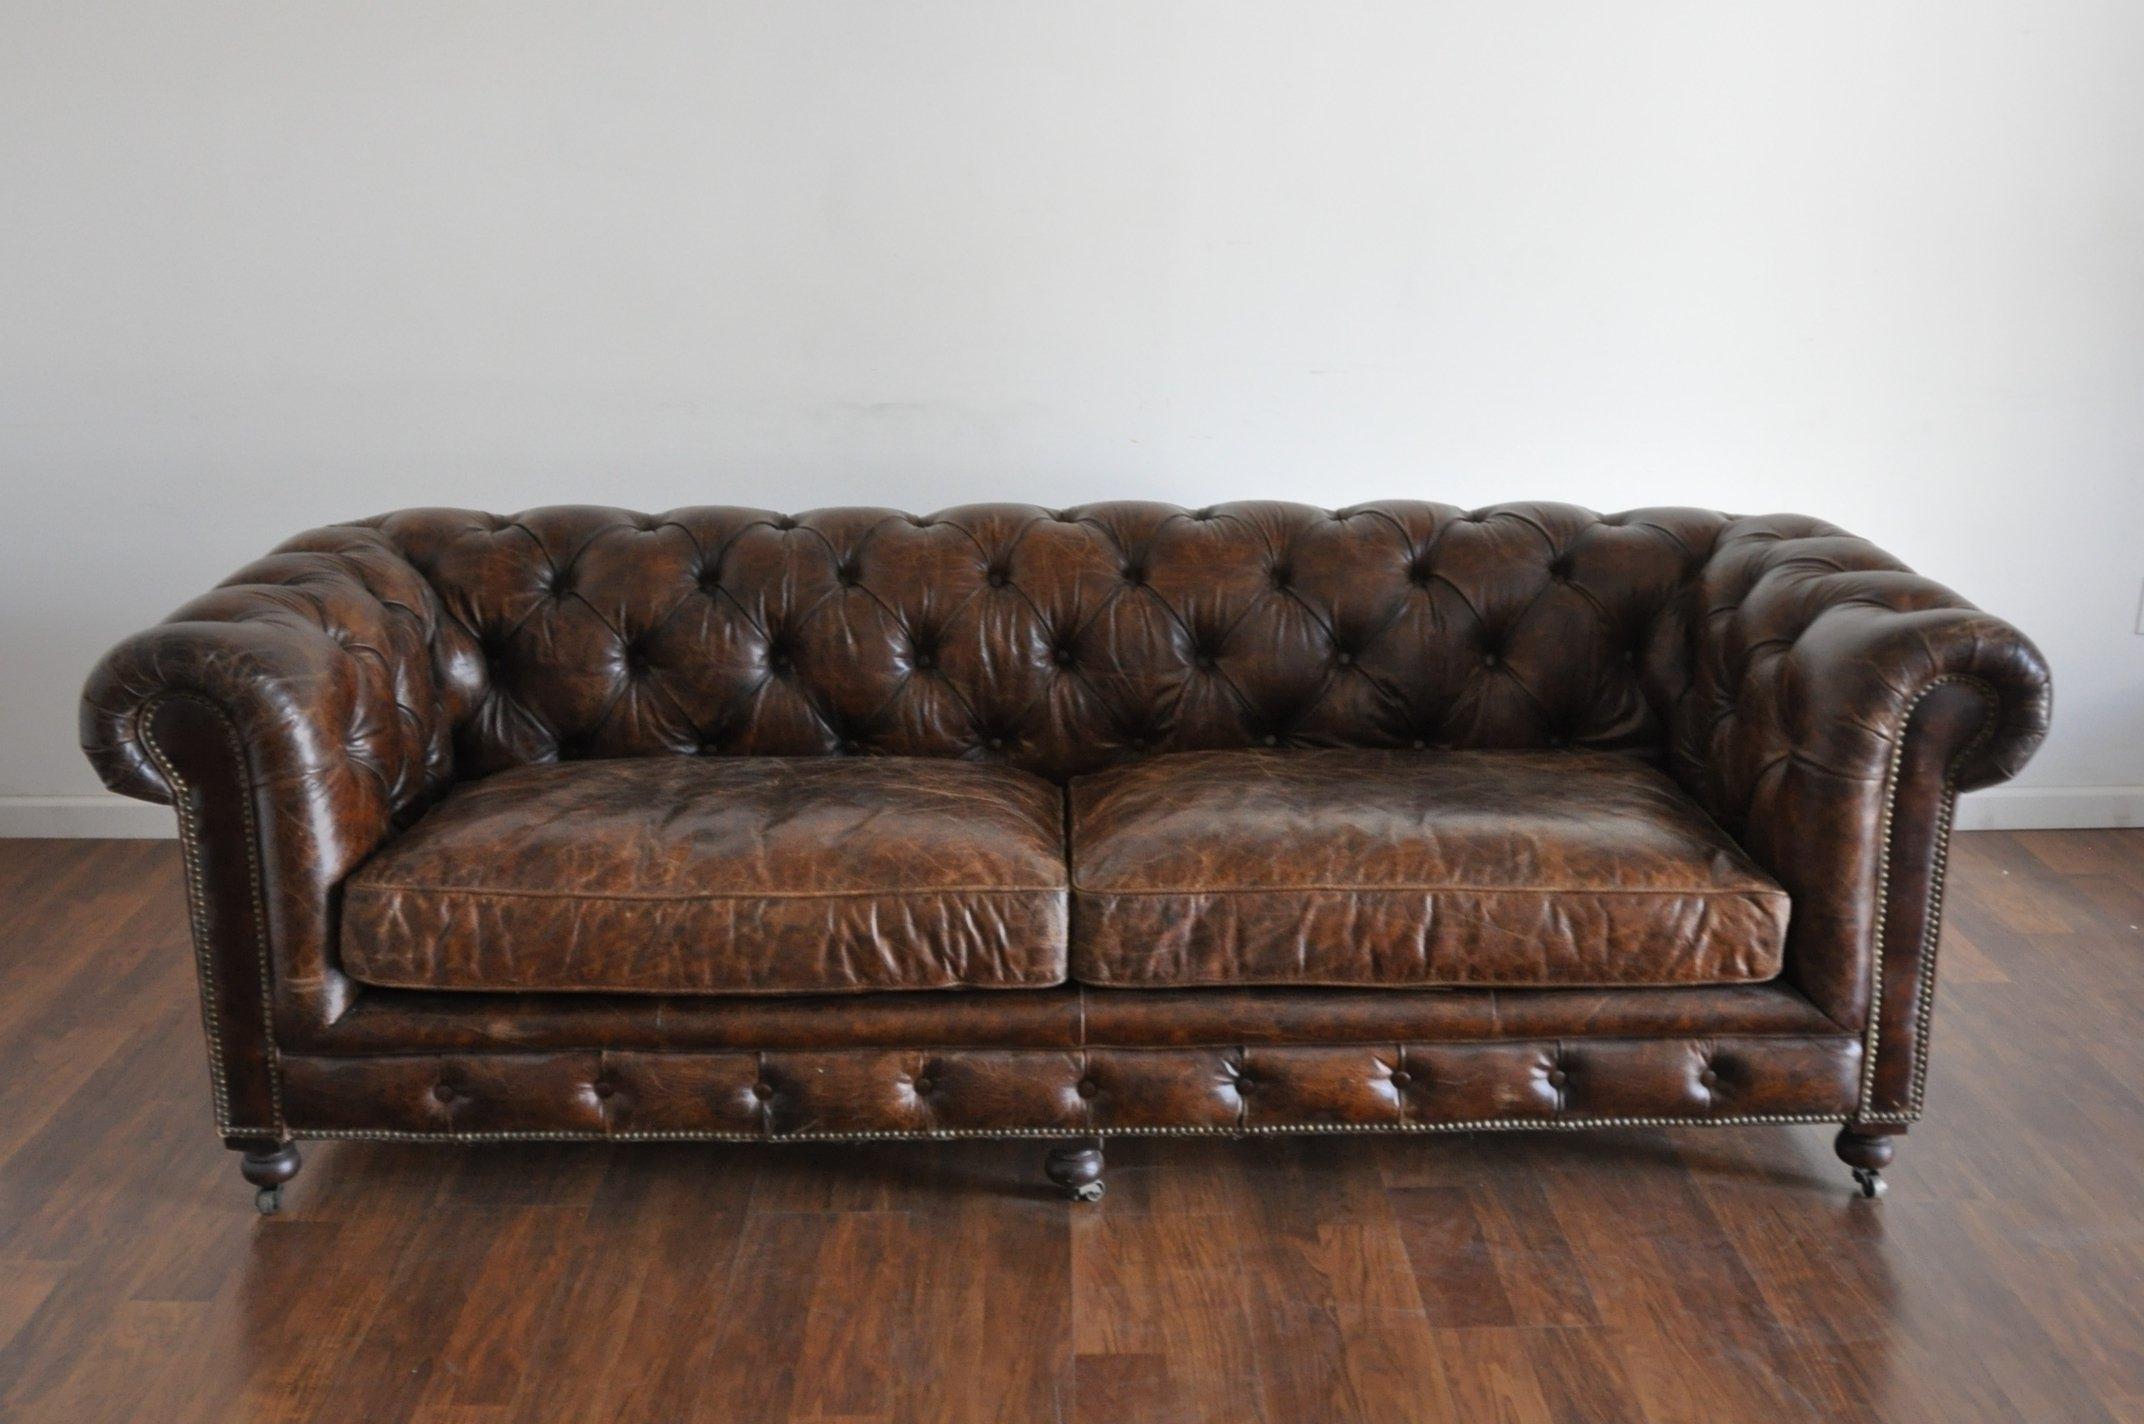 Newest Unusual Sofa Regarding Sofa : 94 Unusual Felton Tufted Sofa Image Ideas Felton Tufted (View 6 of 20)